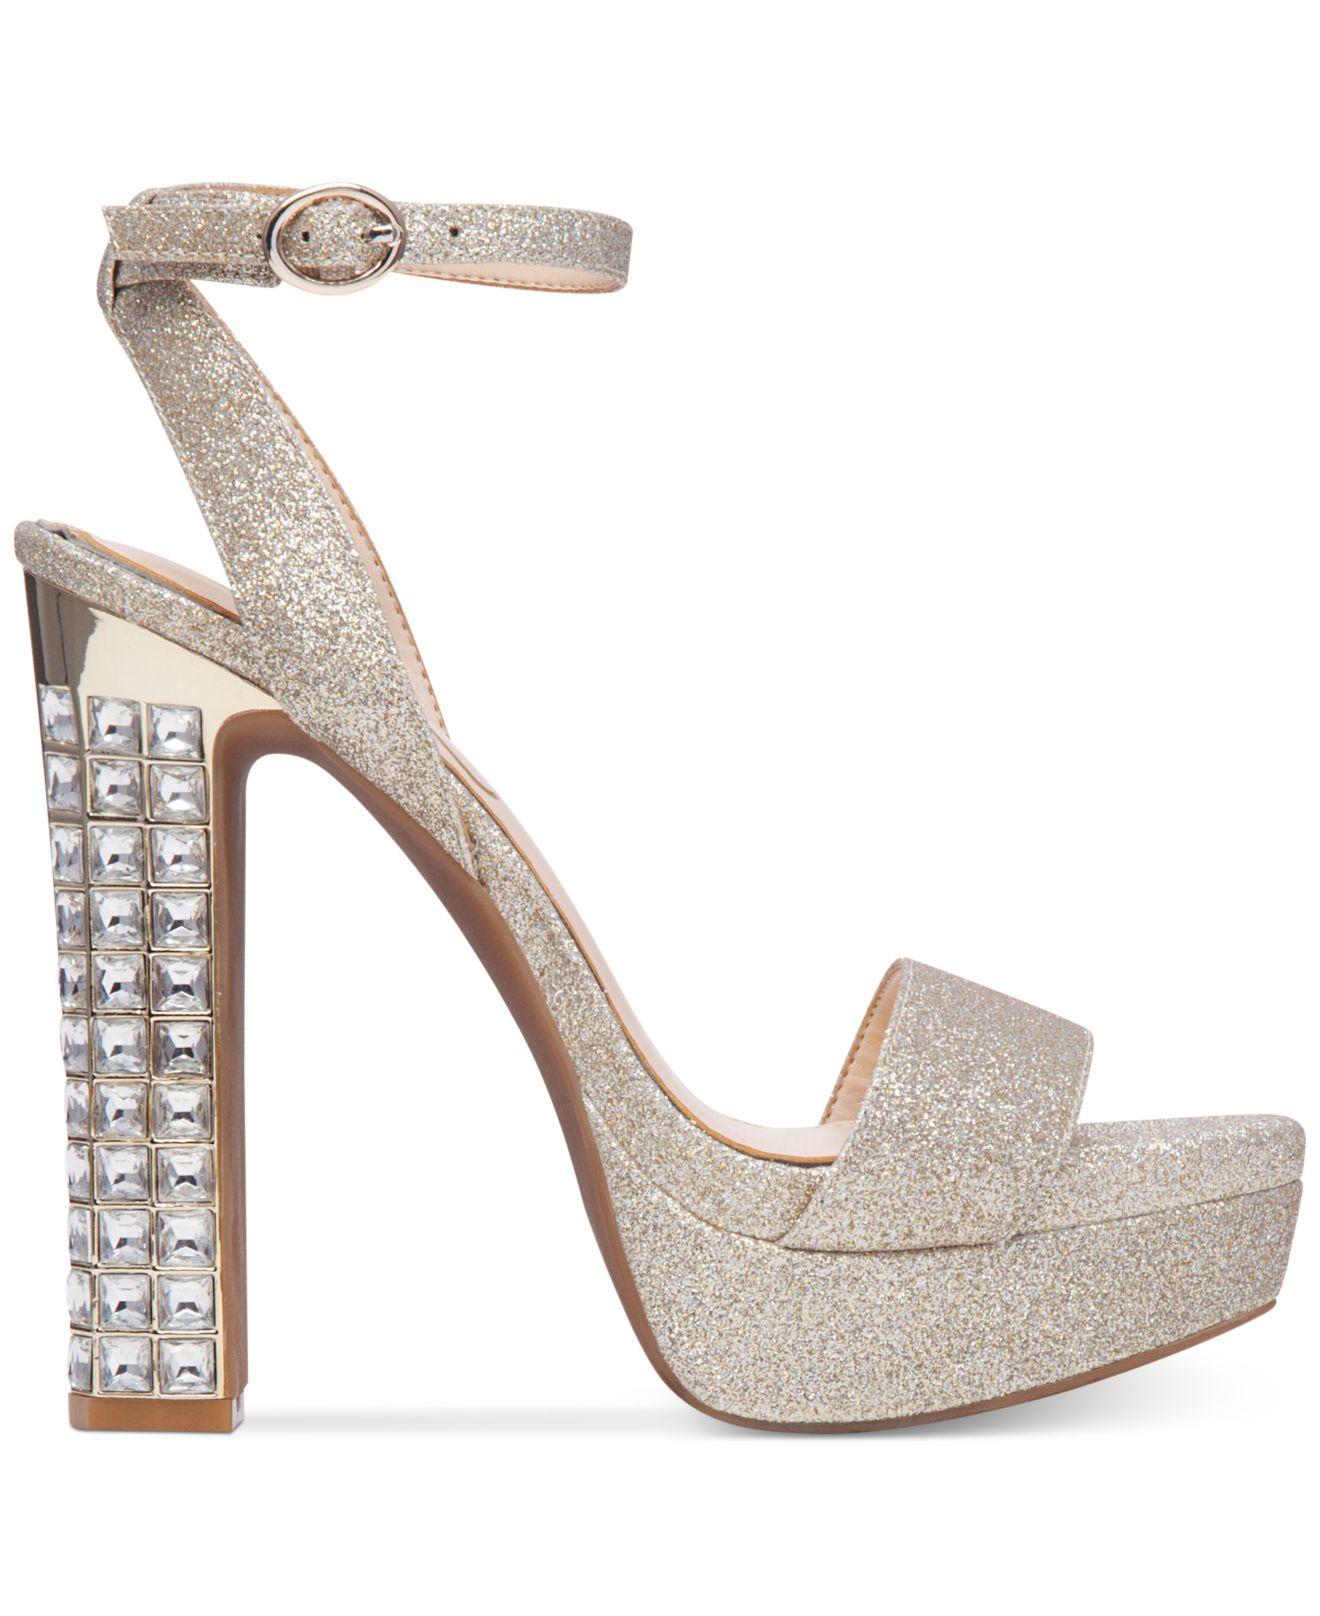 Lyst Jessica Simpson Simpson Simpson Banda Embellished Platform Dress Sandales in ... c5d057